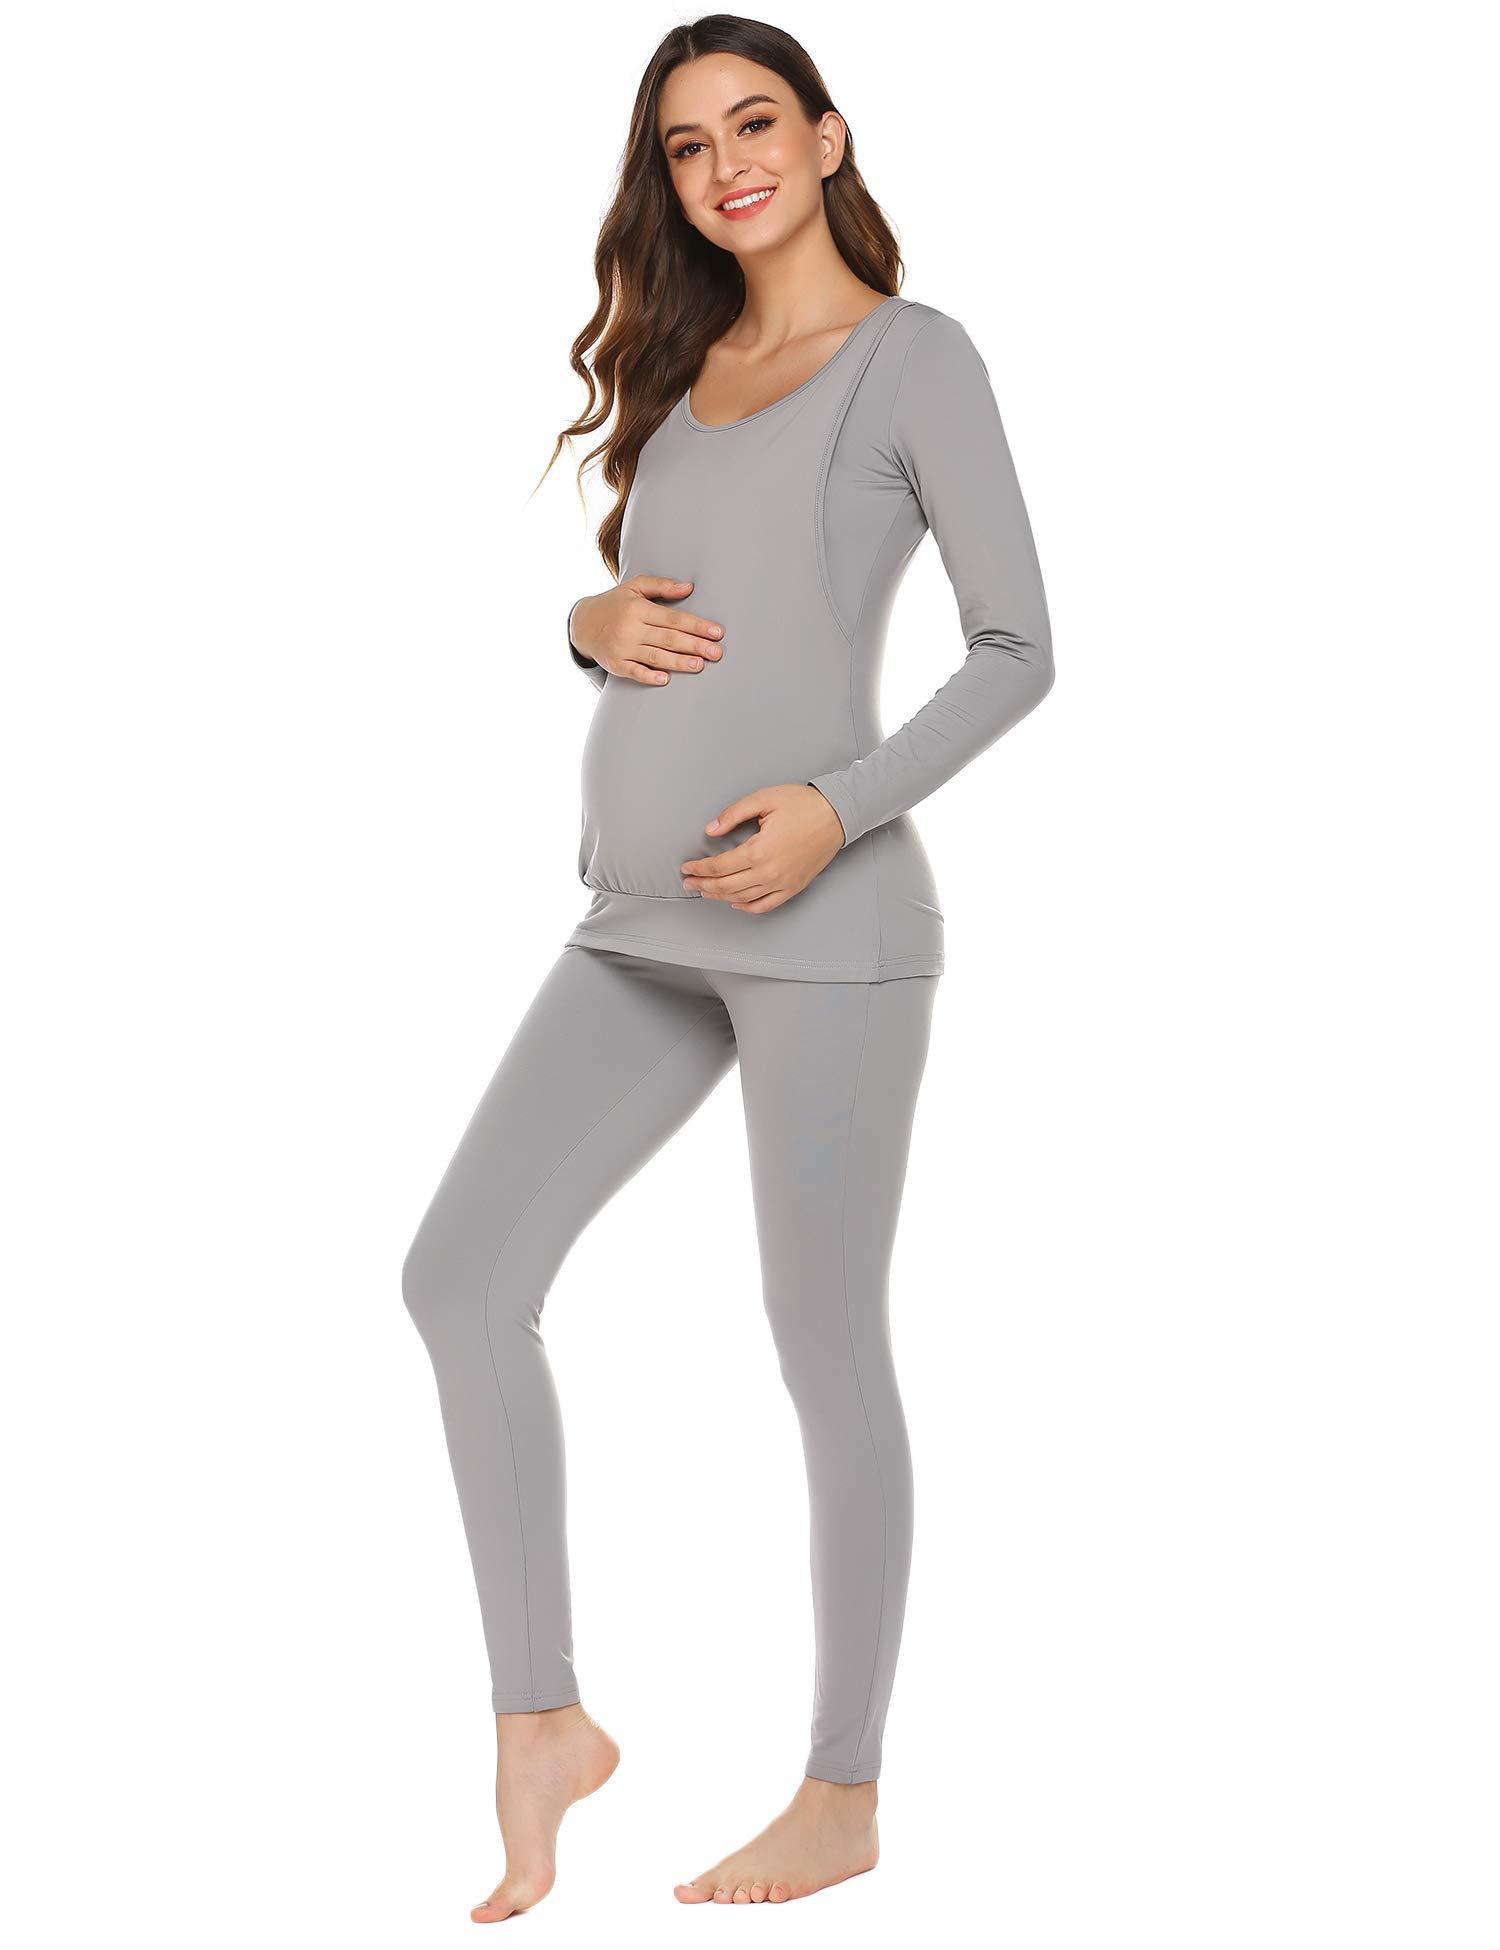 Ekouaer Womens Labor/Delivery/Nursing Ultra Soft Microfiber Fleece Thermal Underwear Long Johns (Grey, X-Large) by Ekouaer